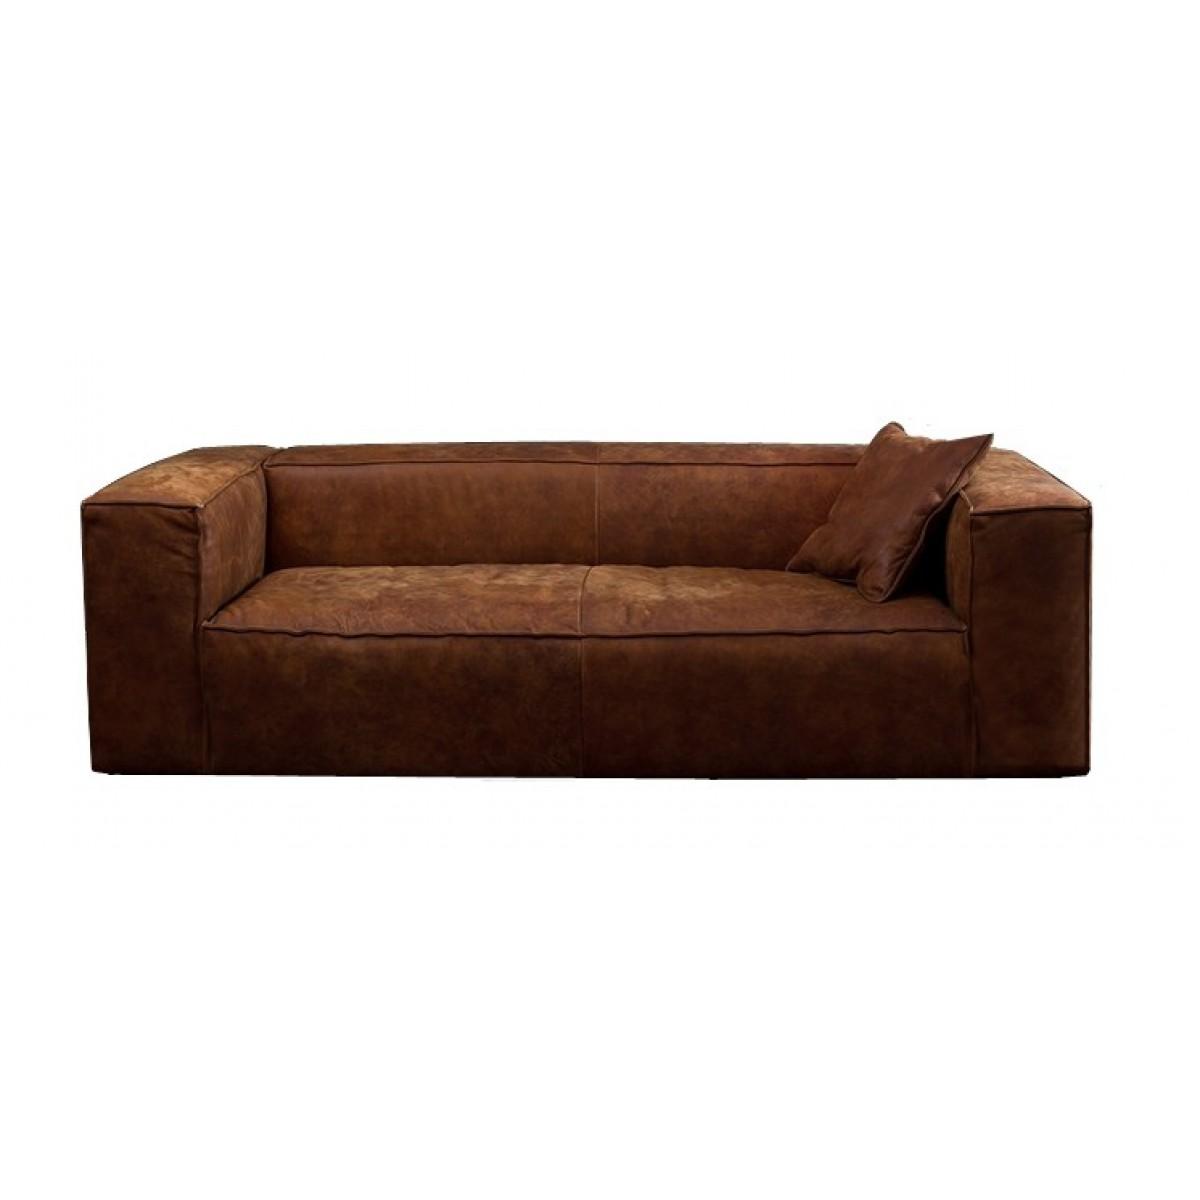 summer-bank-couch-sofa-2,5-3-zits-leer-leder-africa-tabac